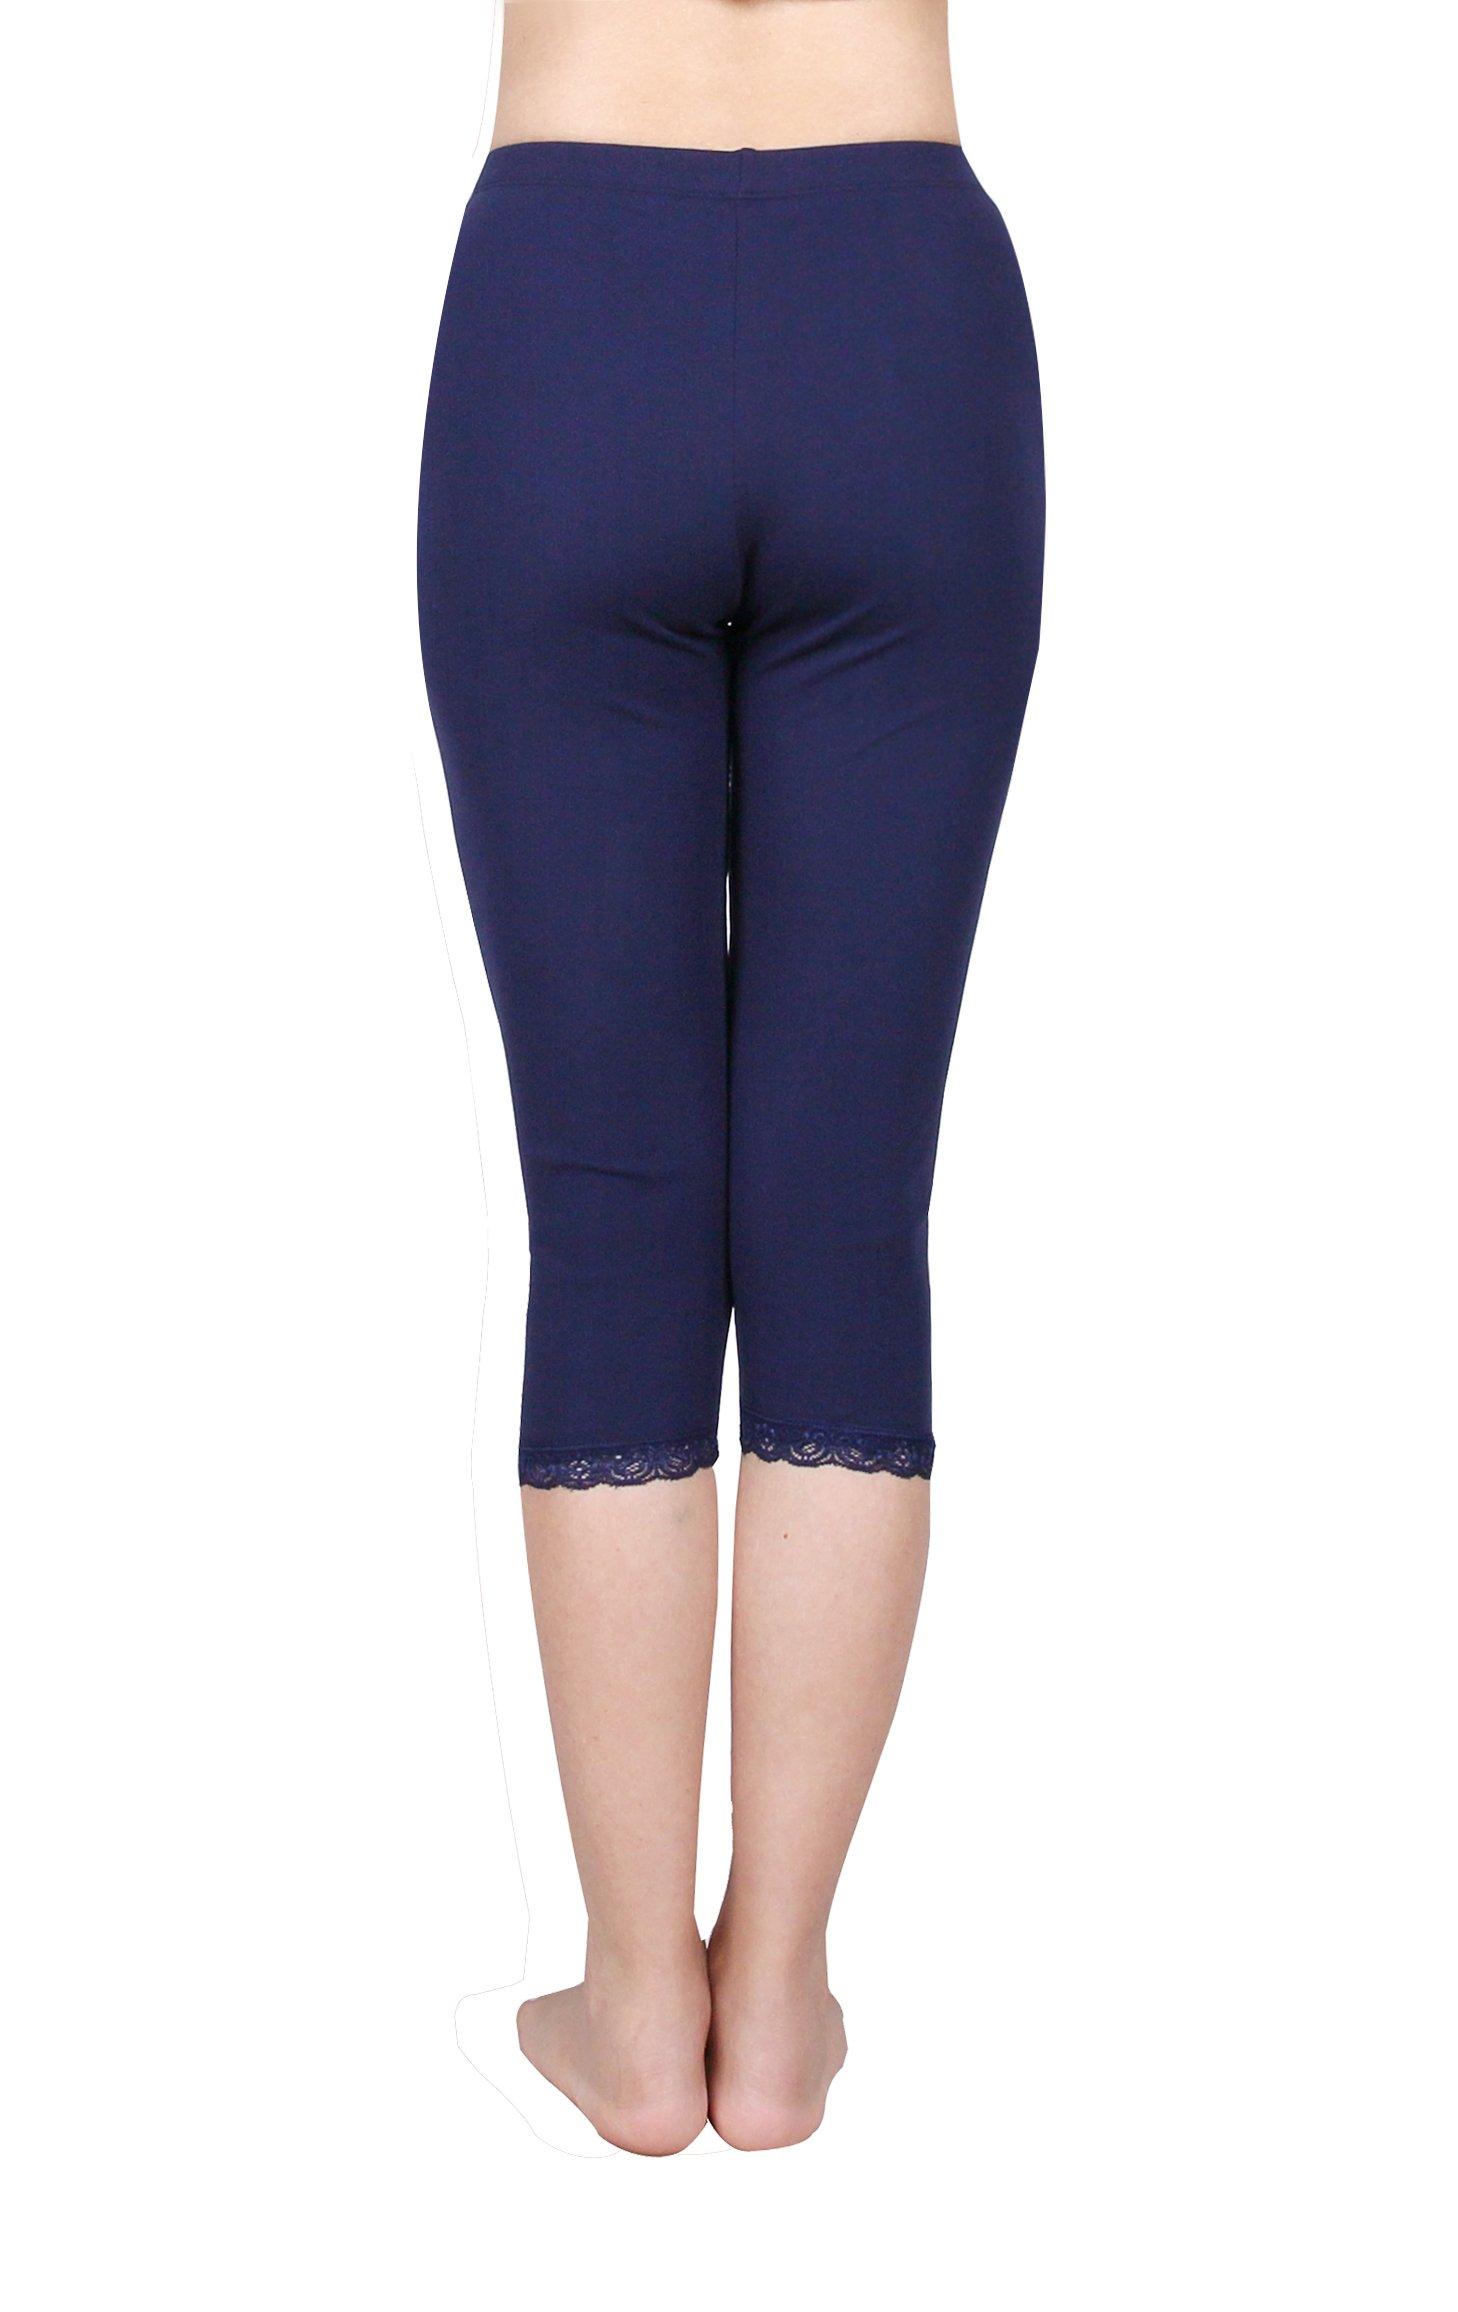 IRELIA 2 Pack Cotton Girls Leggings Capri with Lace Trim Pant Size 6-16 03 M by IRELIA (Image #4)